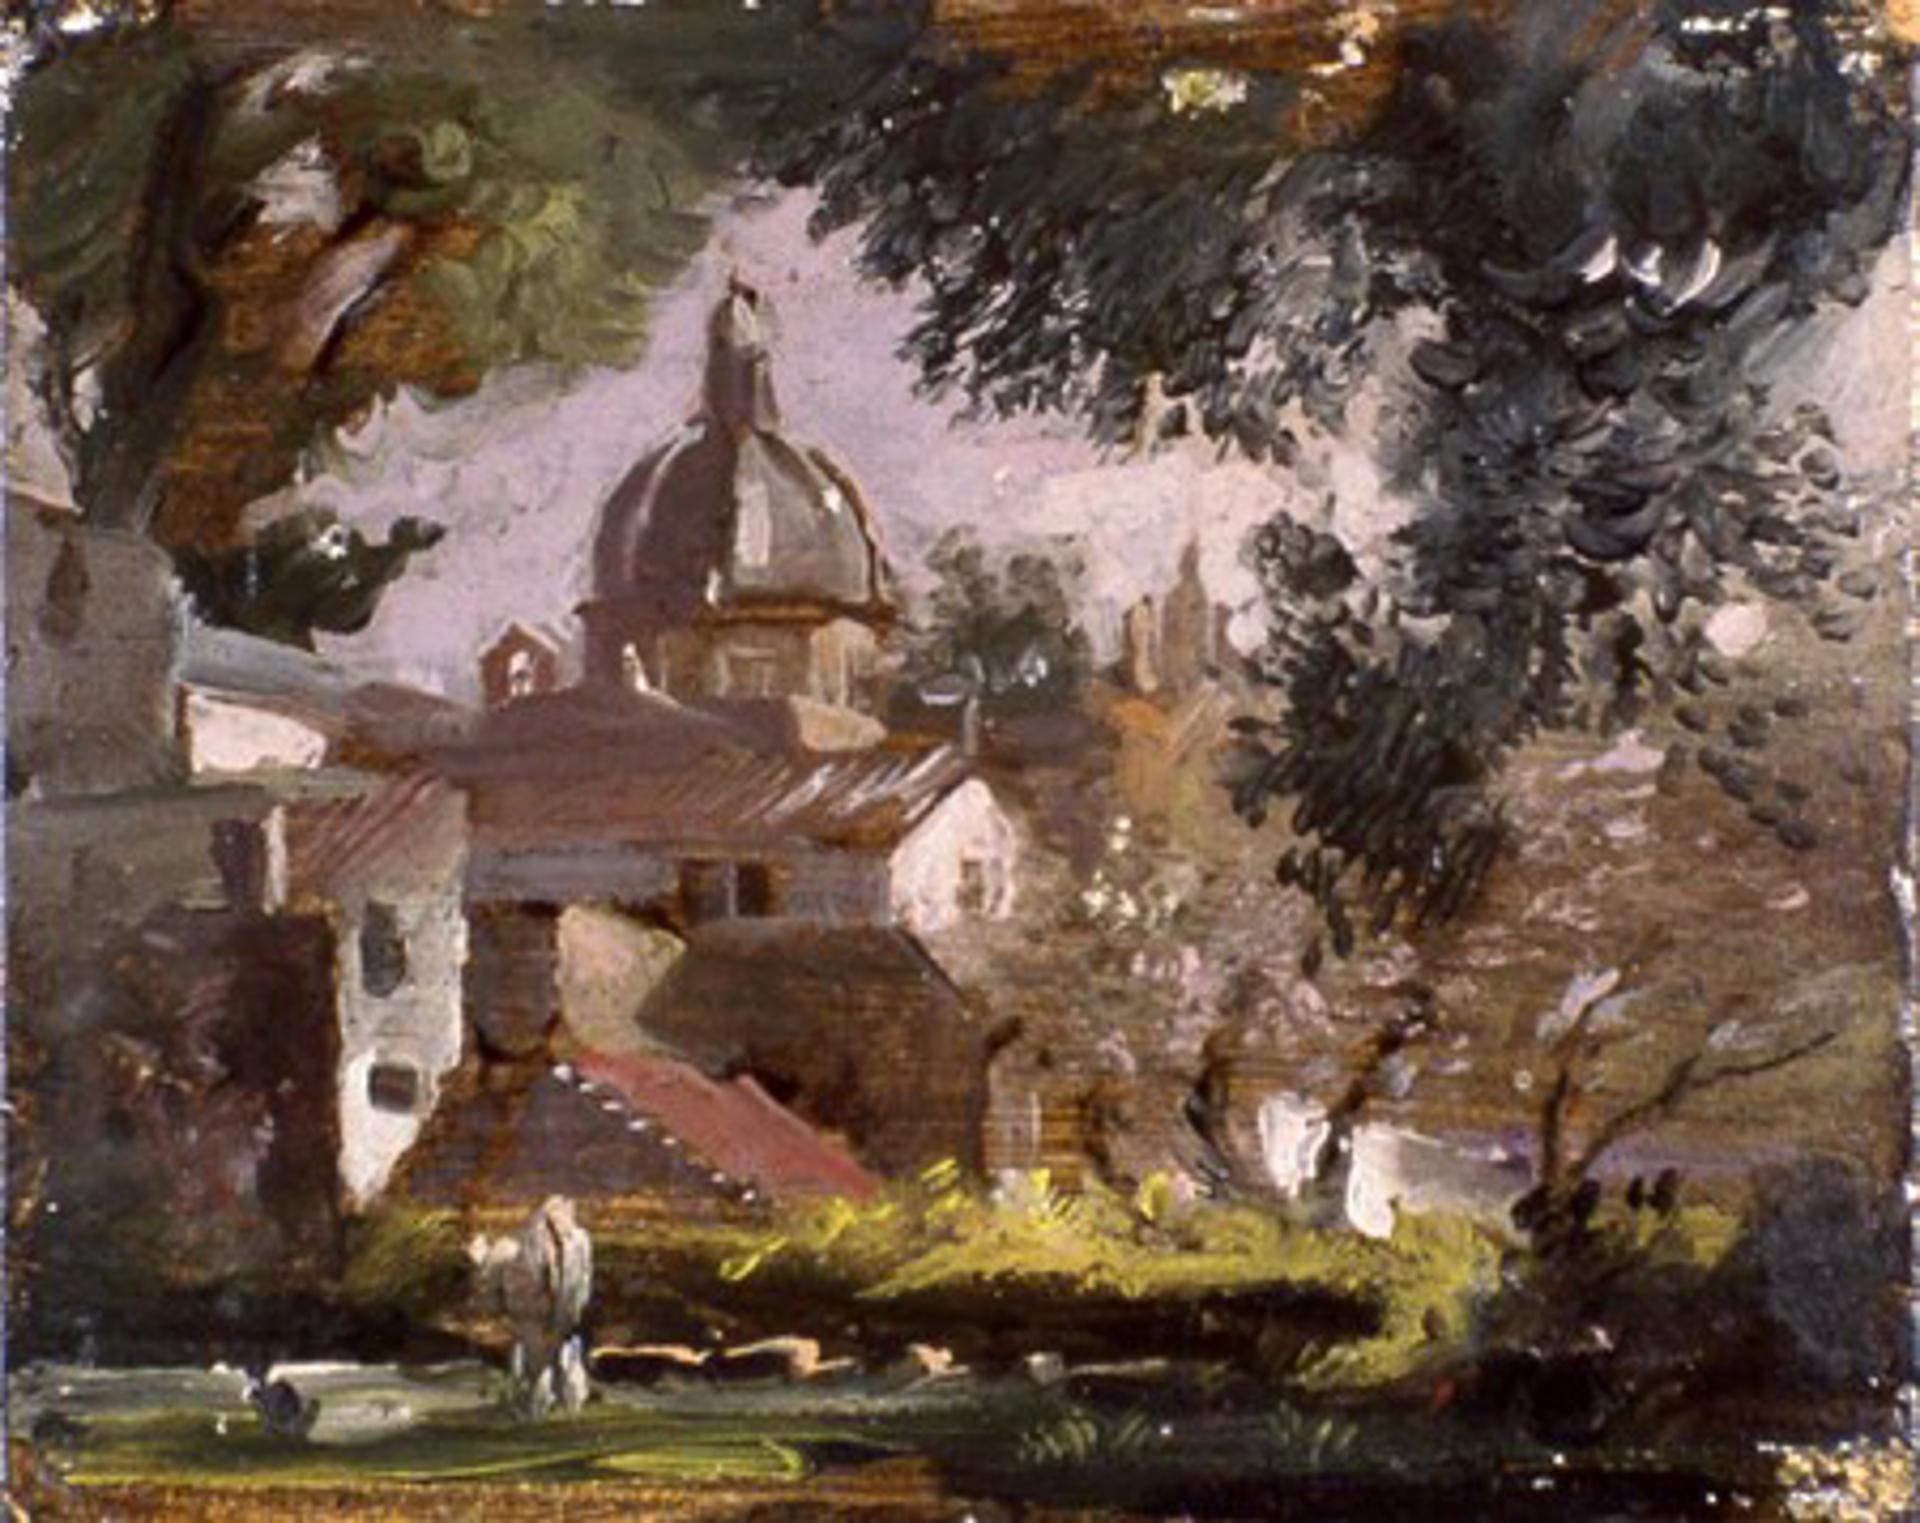 Lake Near Rome by Frank Mason (1921 - 2009)